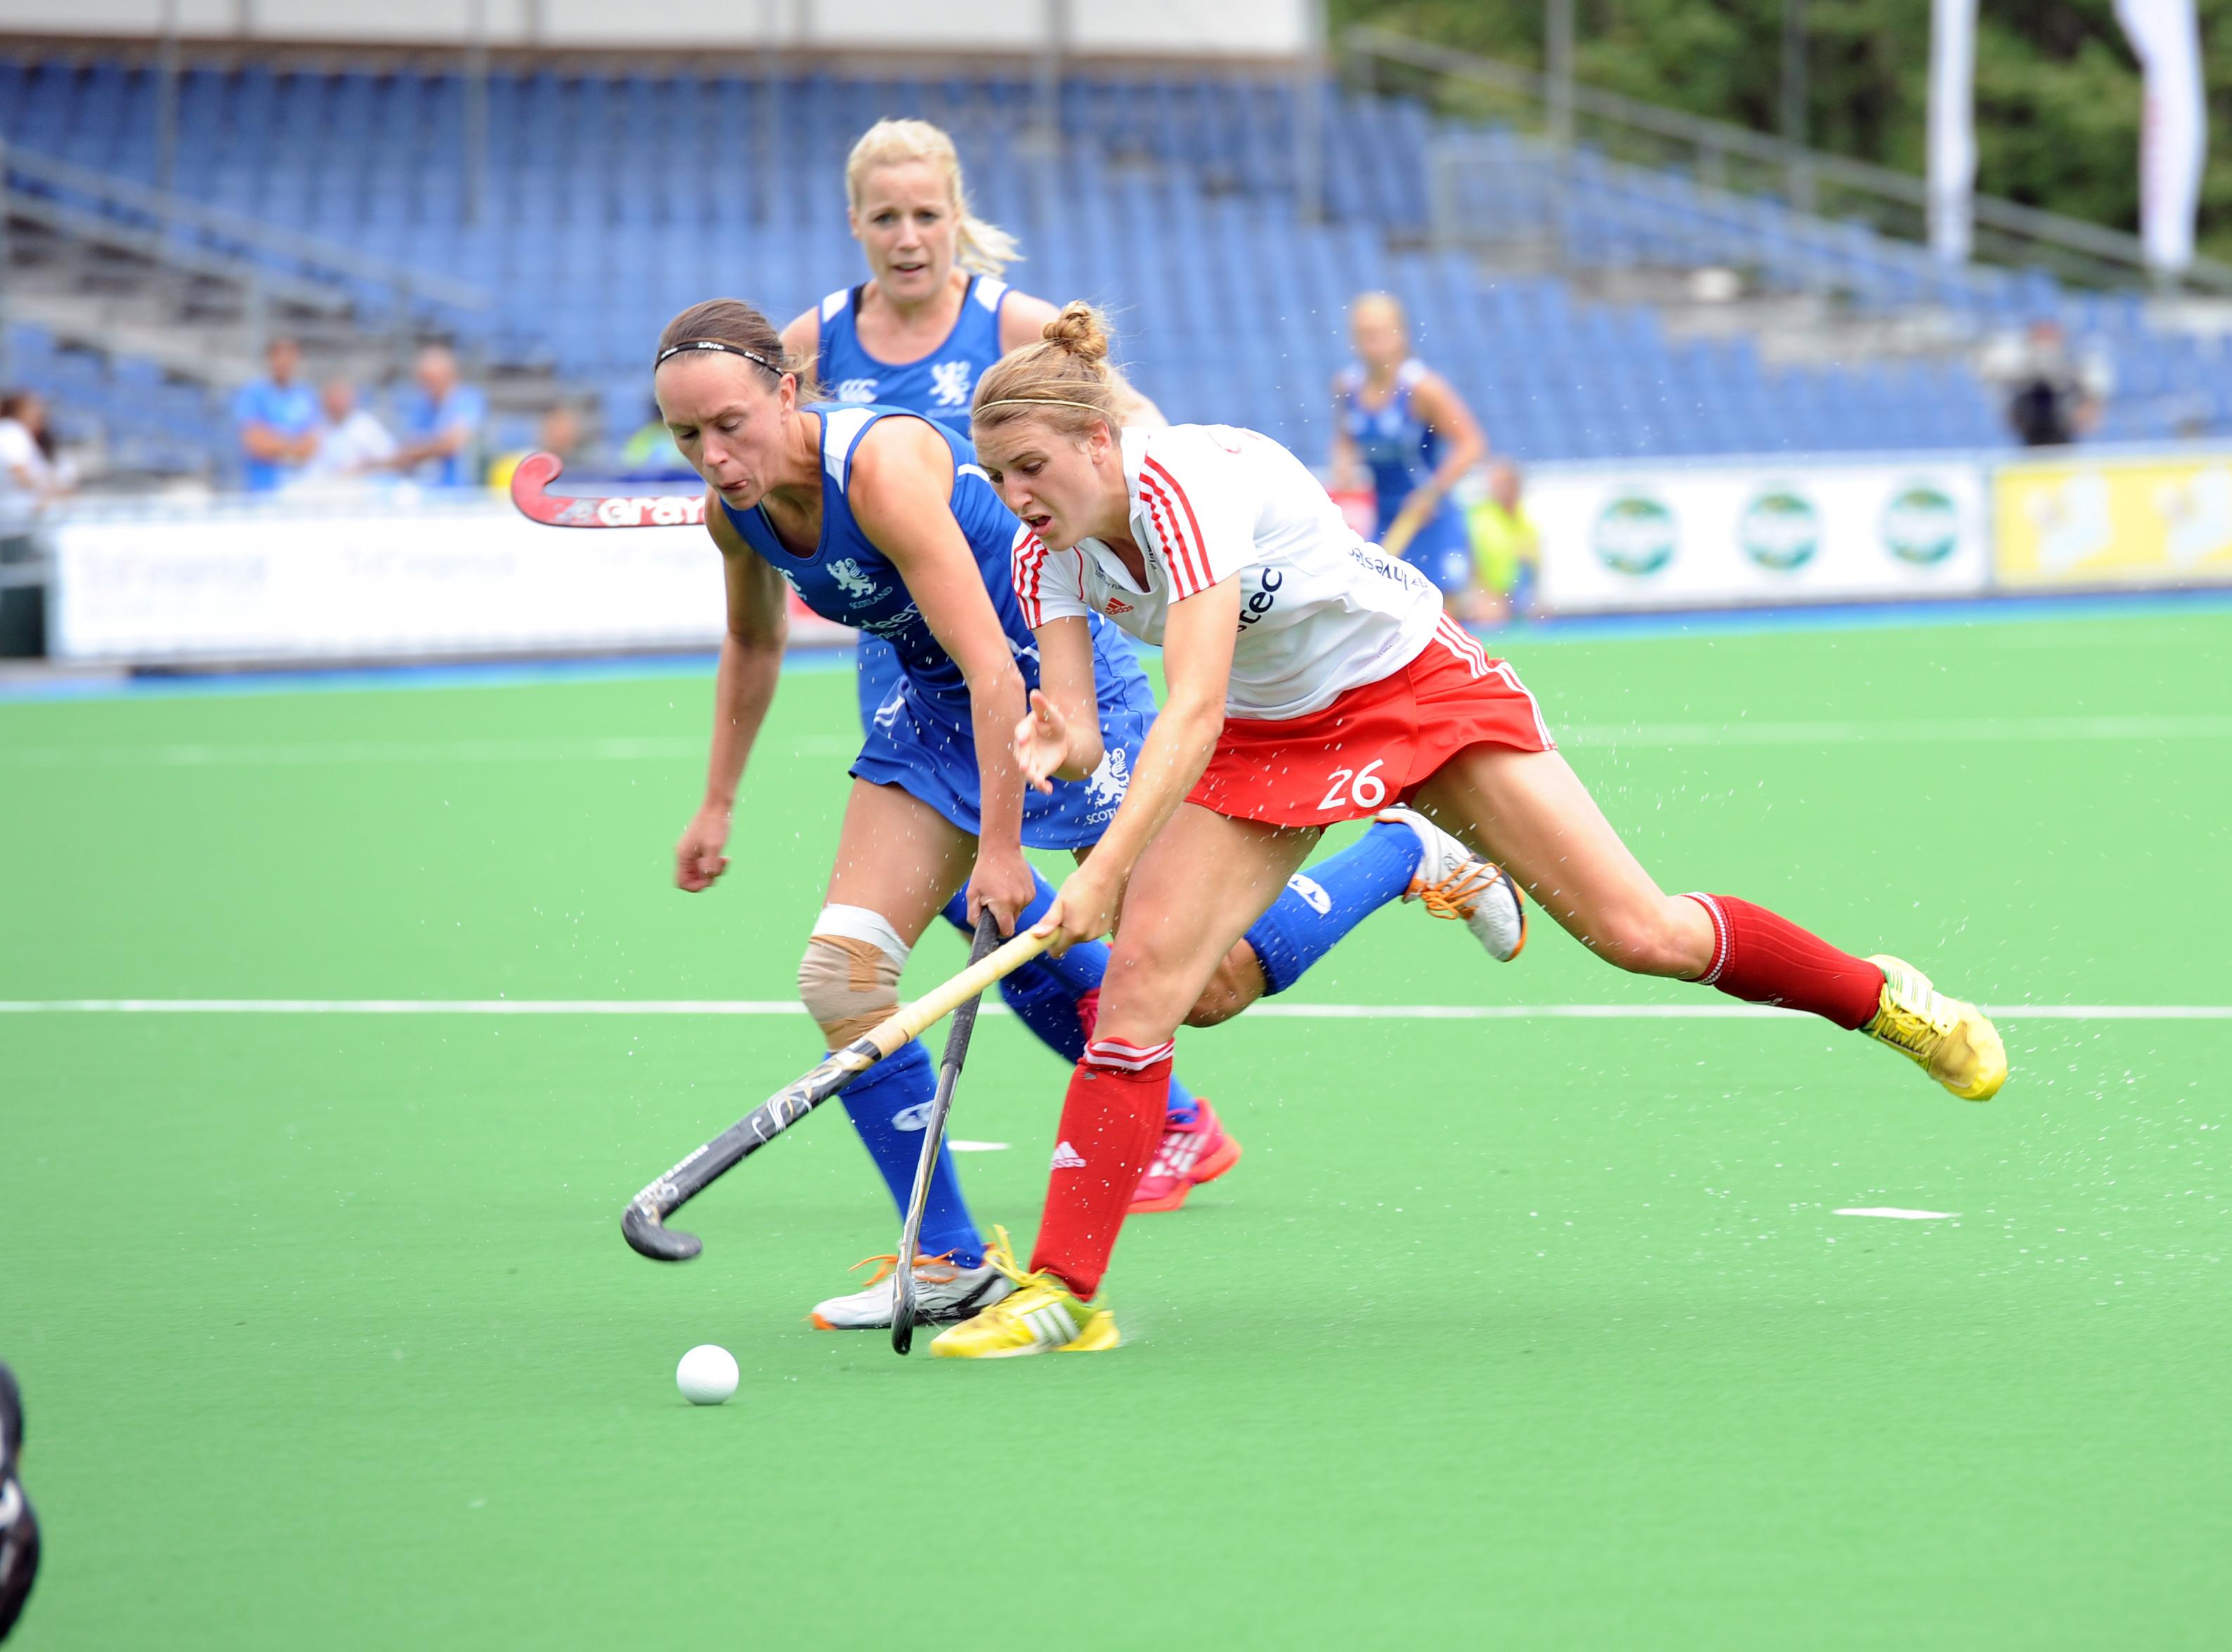 England vs Scotland at the 2013 Euros (c) hockeyimages.co.uk